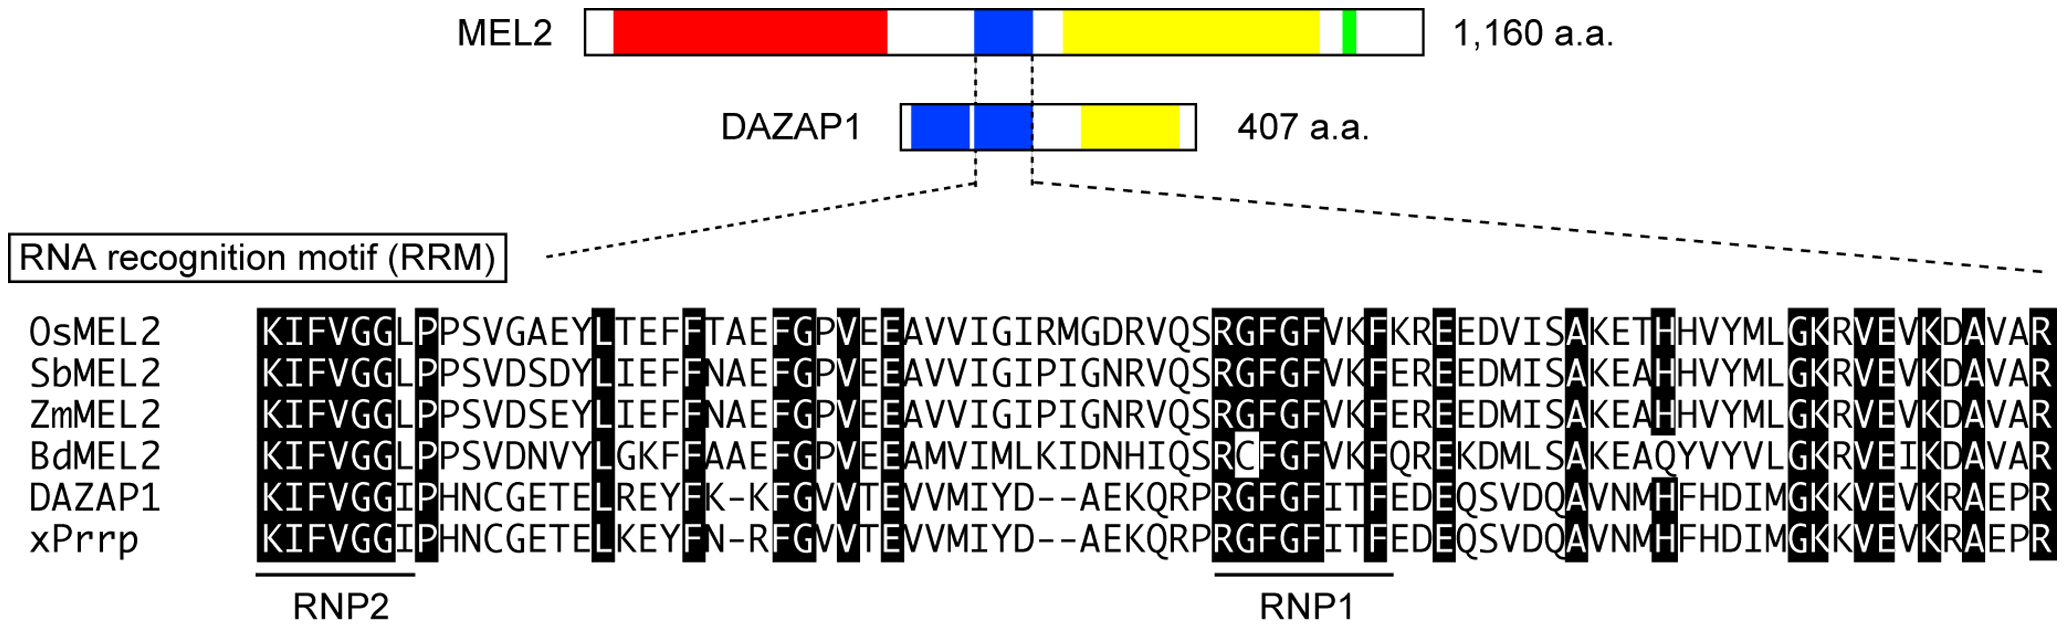 Rice MEL2 is the RRM protein partially homologous to human DAZAP1.